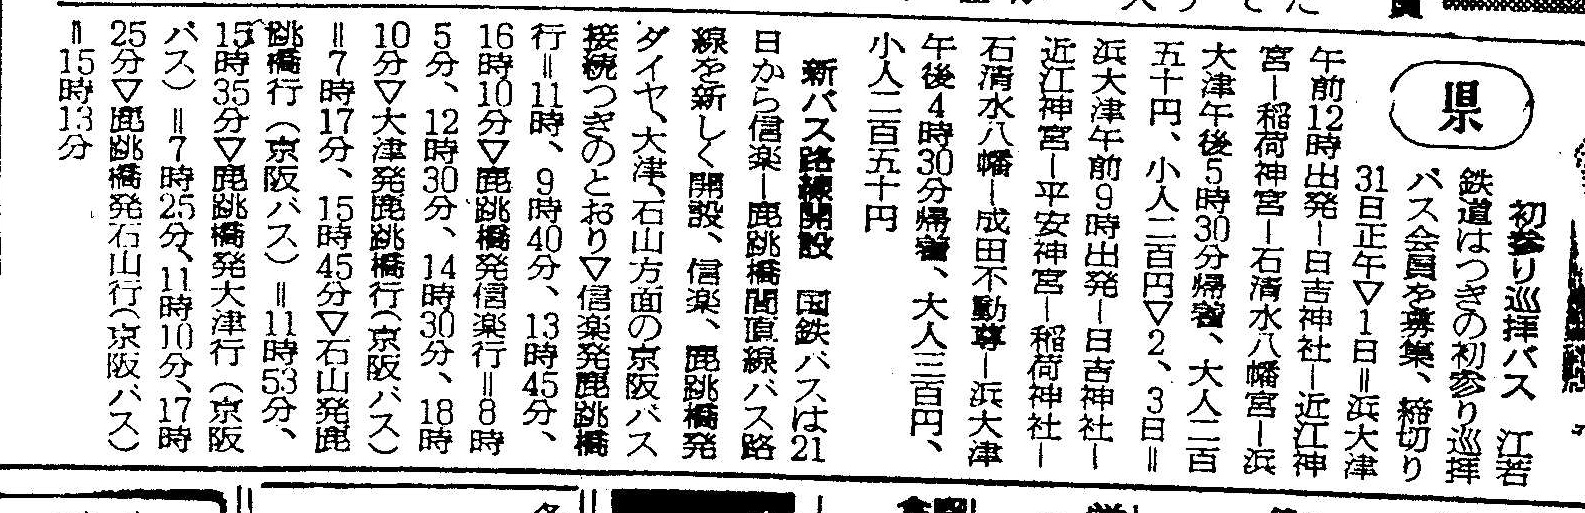 S30.12.18 読 国鉄バス信楽‐鹿跳開設、京阪接続b